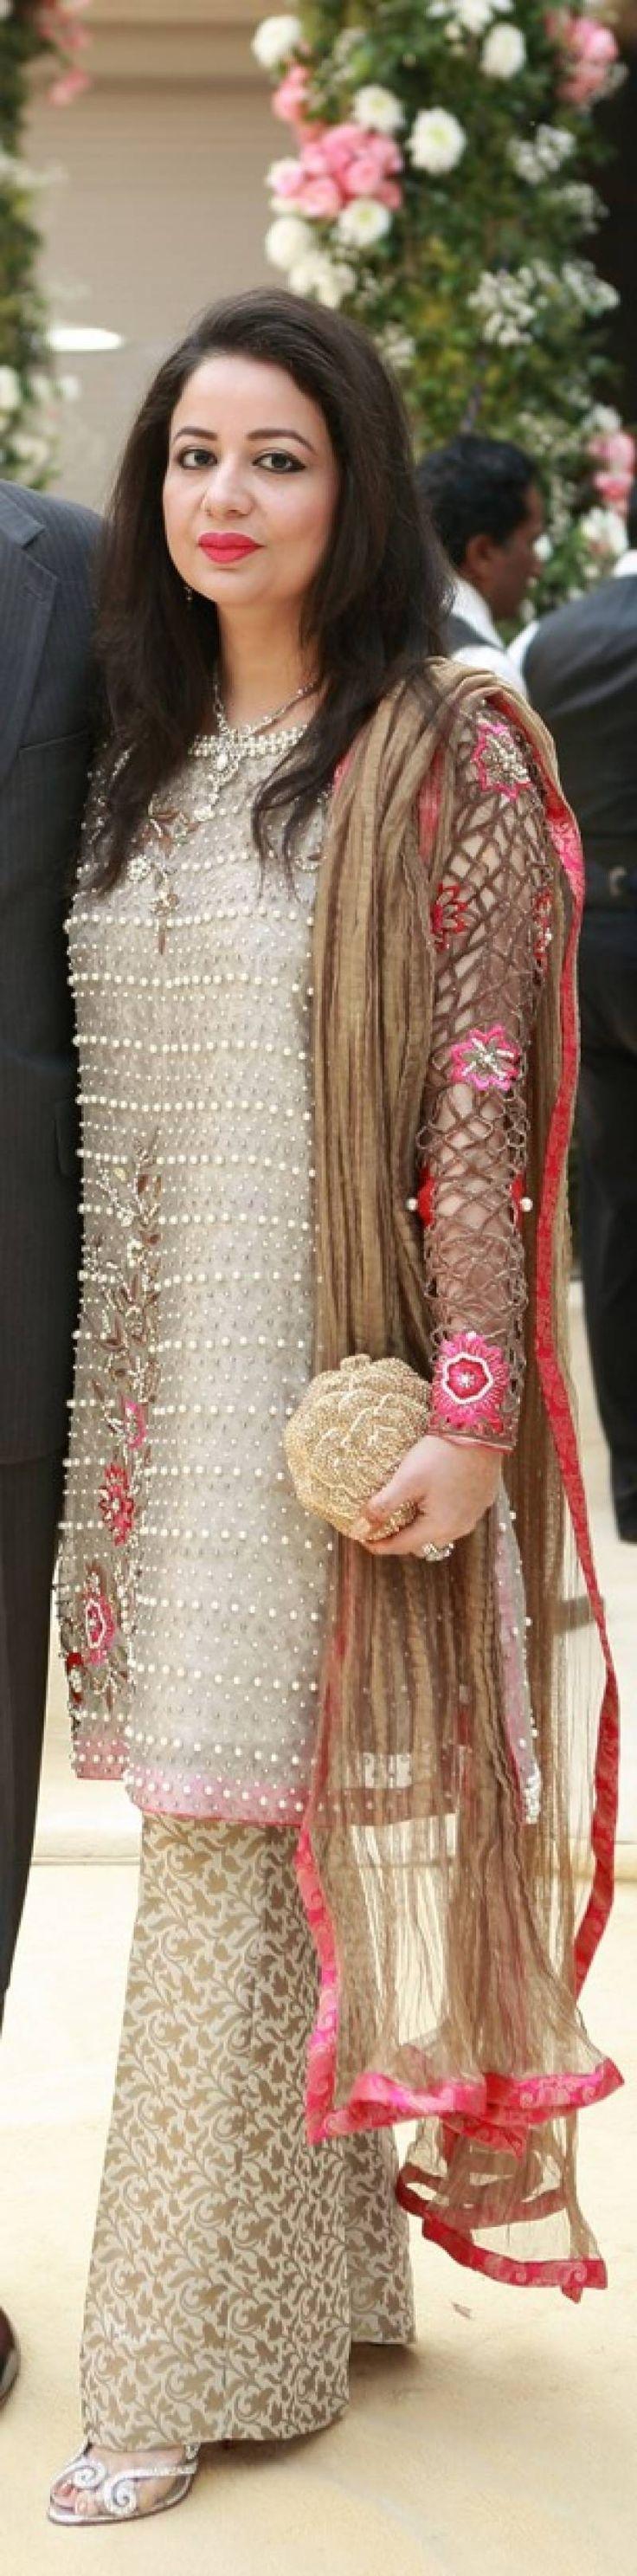 #TrendingNow: Girls In Pearls